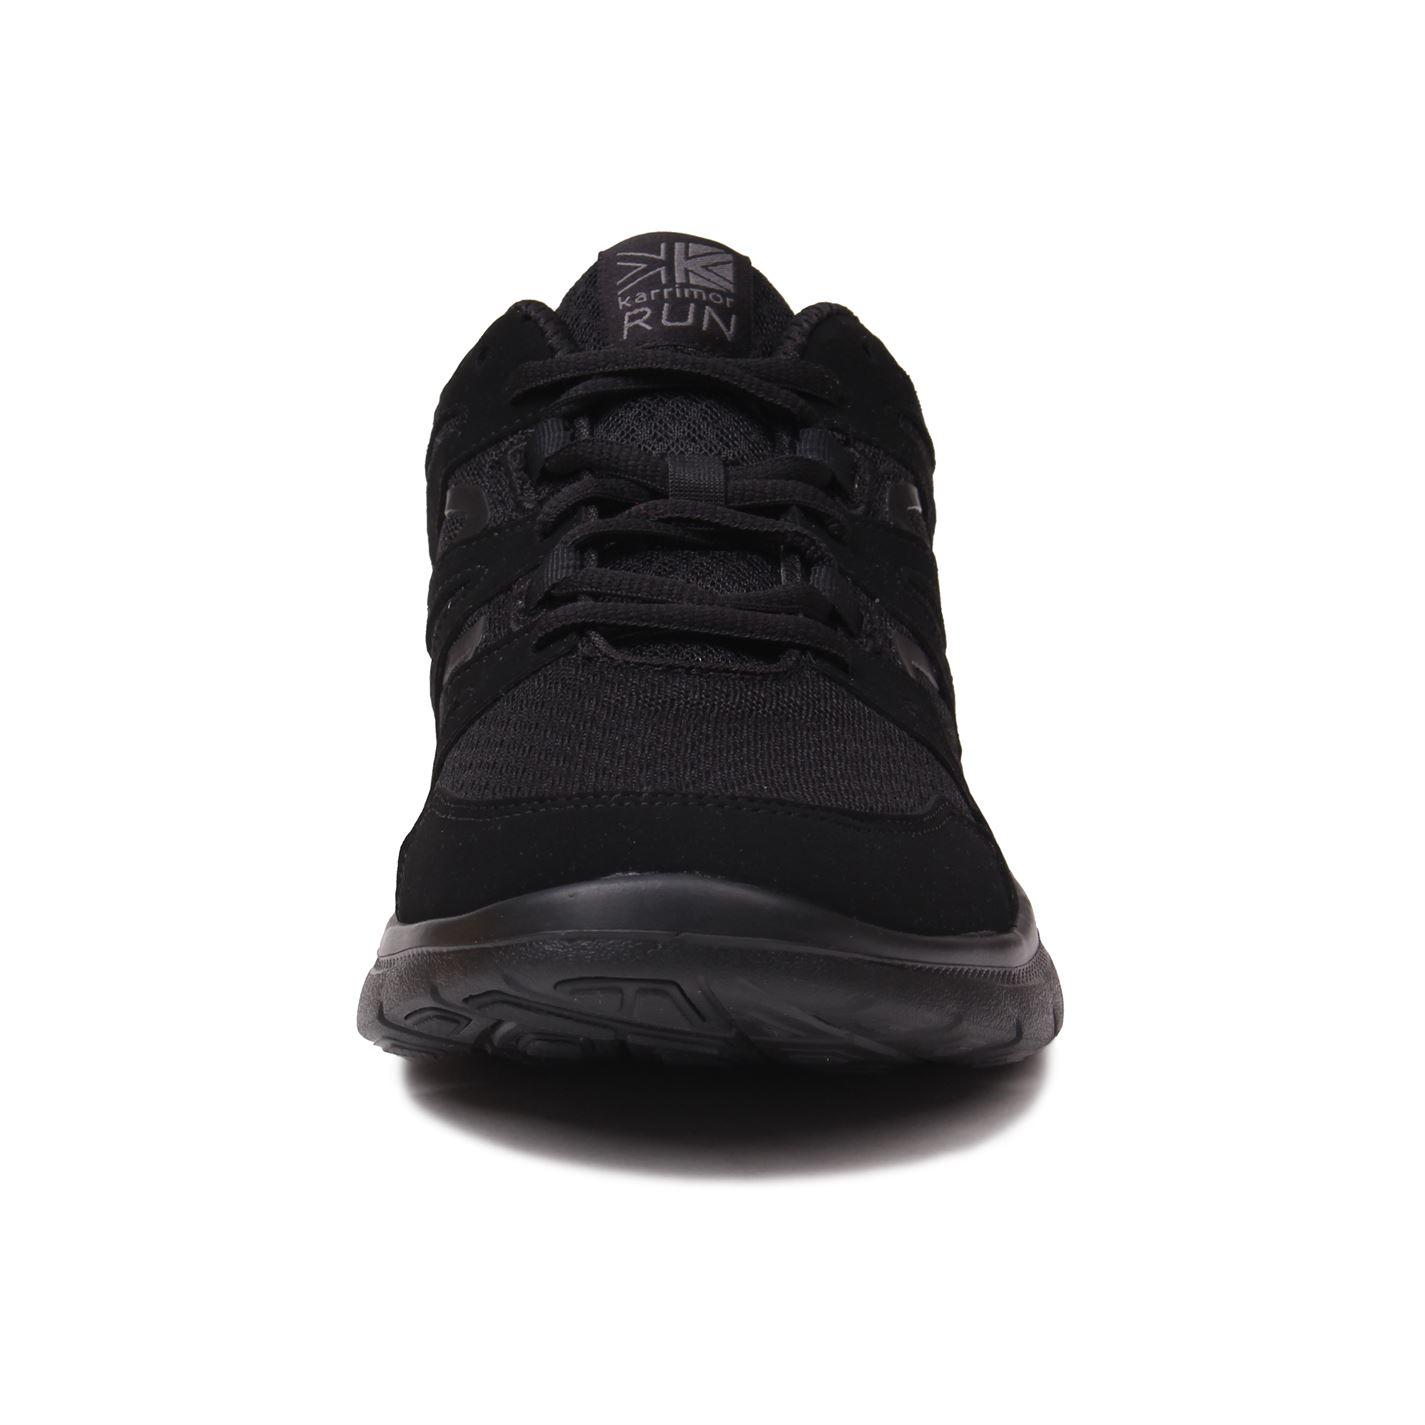 Karrimor-Mens-Duma-Trainers-Lace-Up-Sports-Running-Cross-Training-Shoes thumbnail 38